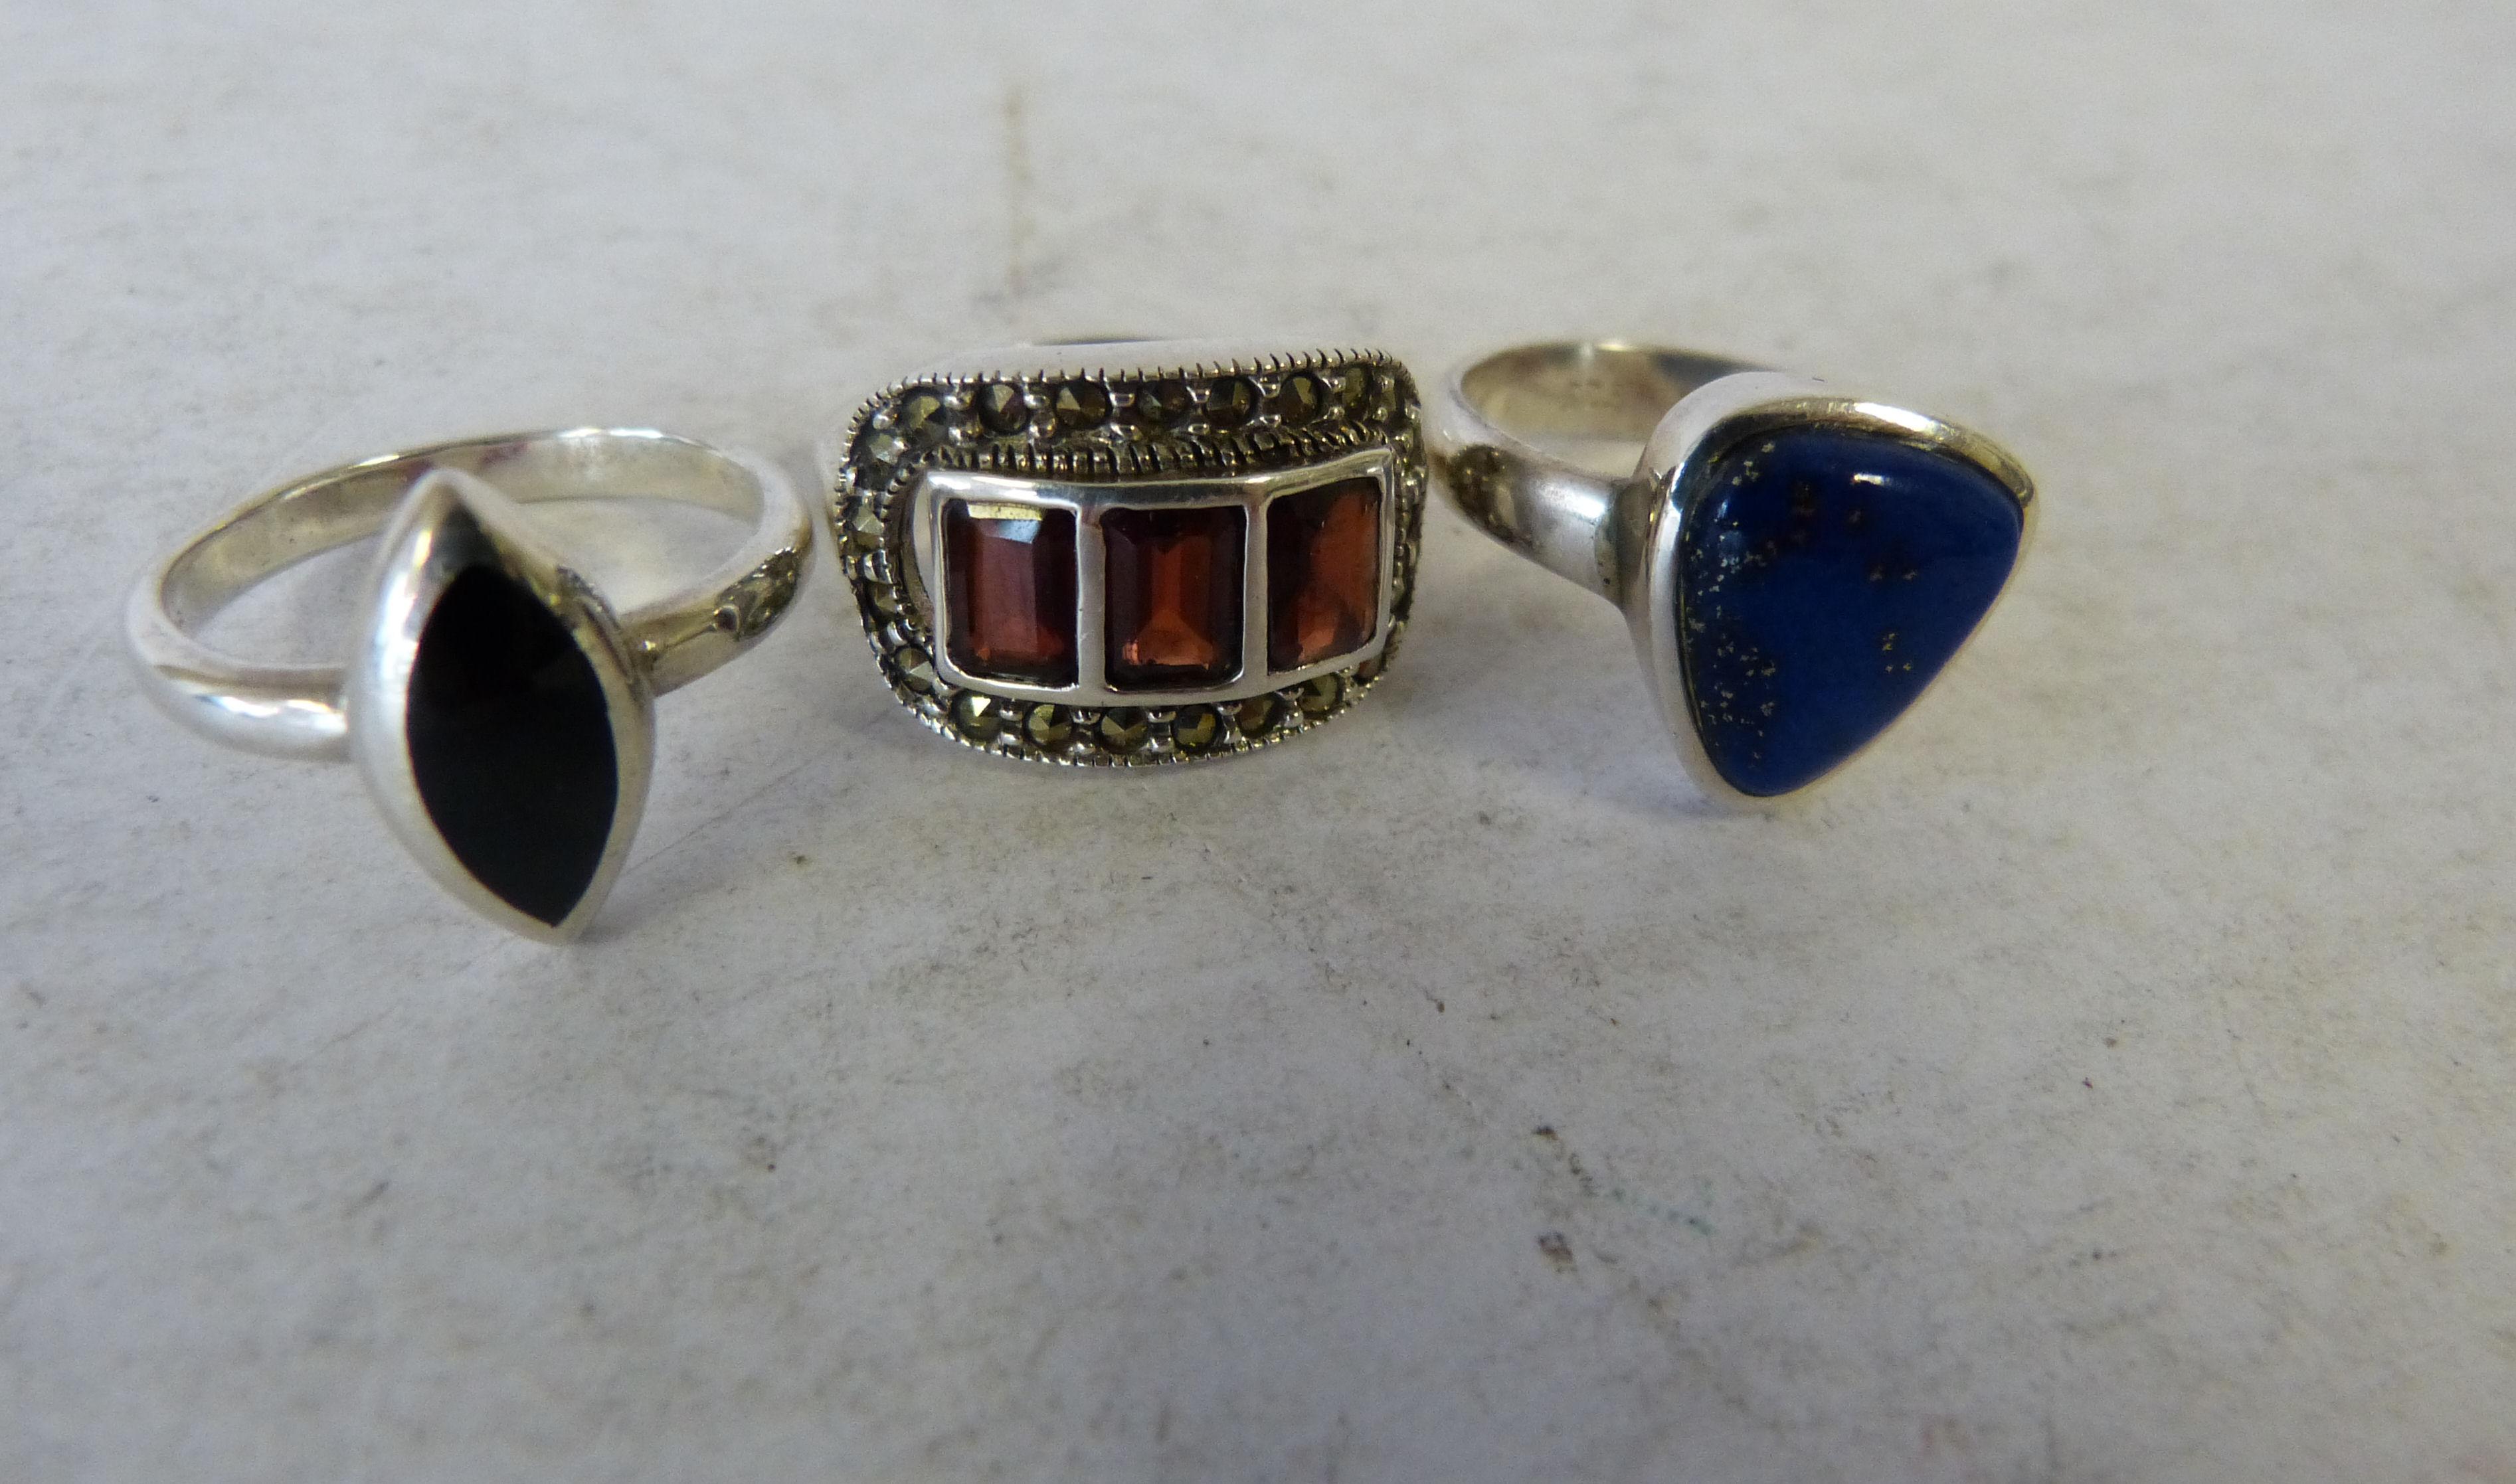 A .925 Silver Garnet & Marasite Ring, a silver and onyx ring and a silver and lapis lazuli ring